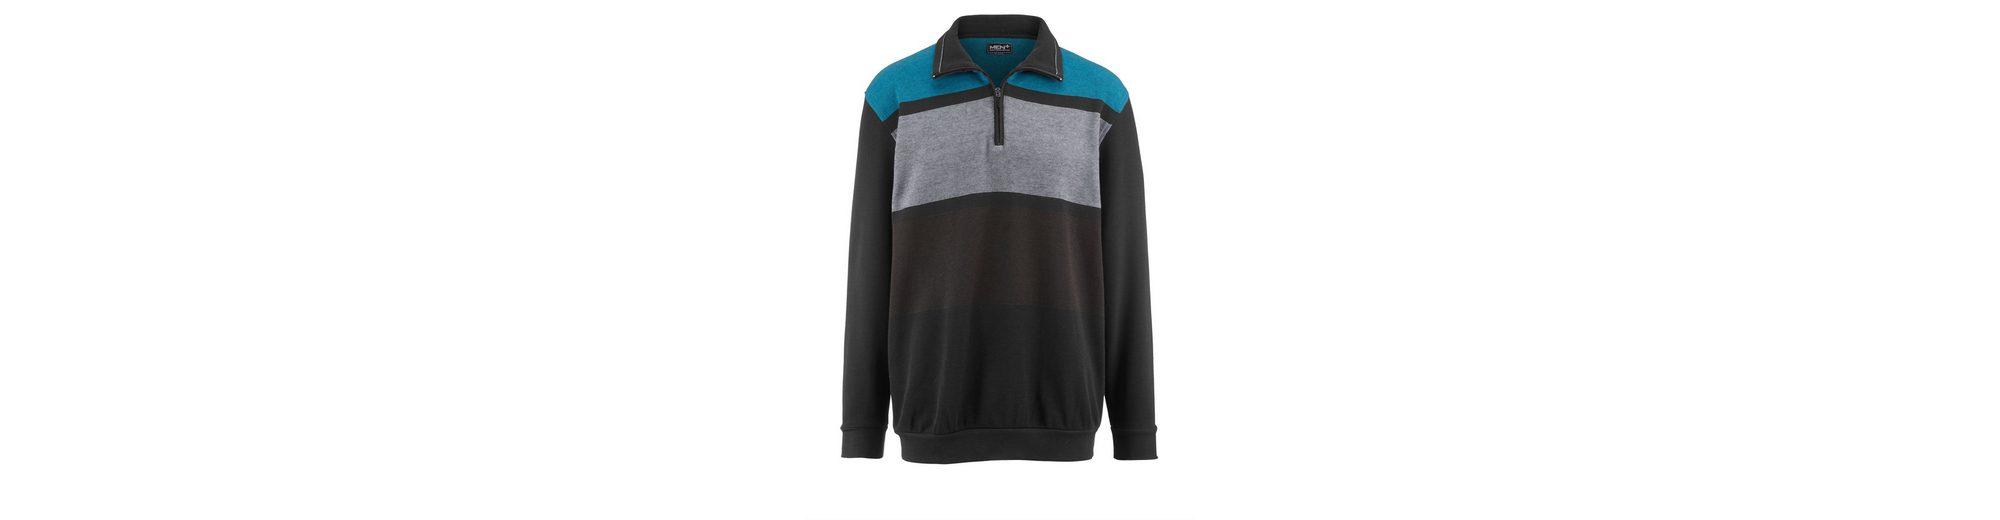 Spielraum Bester Großhandel Aaa Qualität Men Plus by Happy Size Spezial-Bauchschnitt Sweatshirt p0bWsP3JG